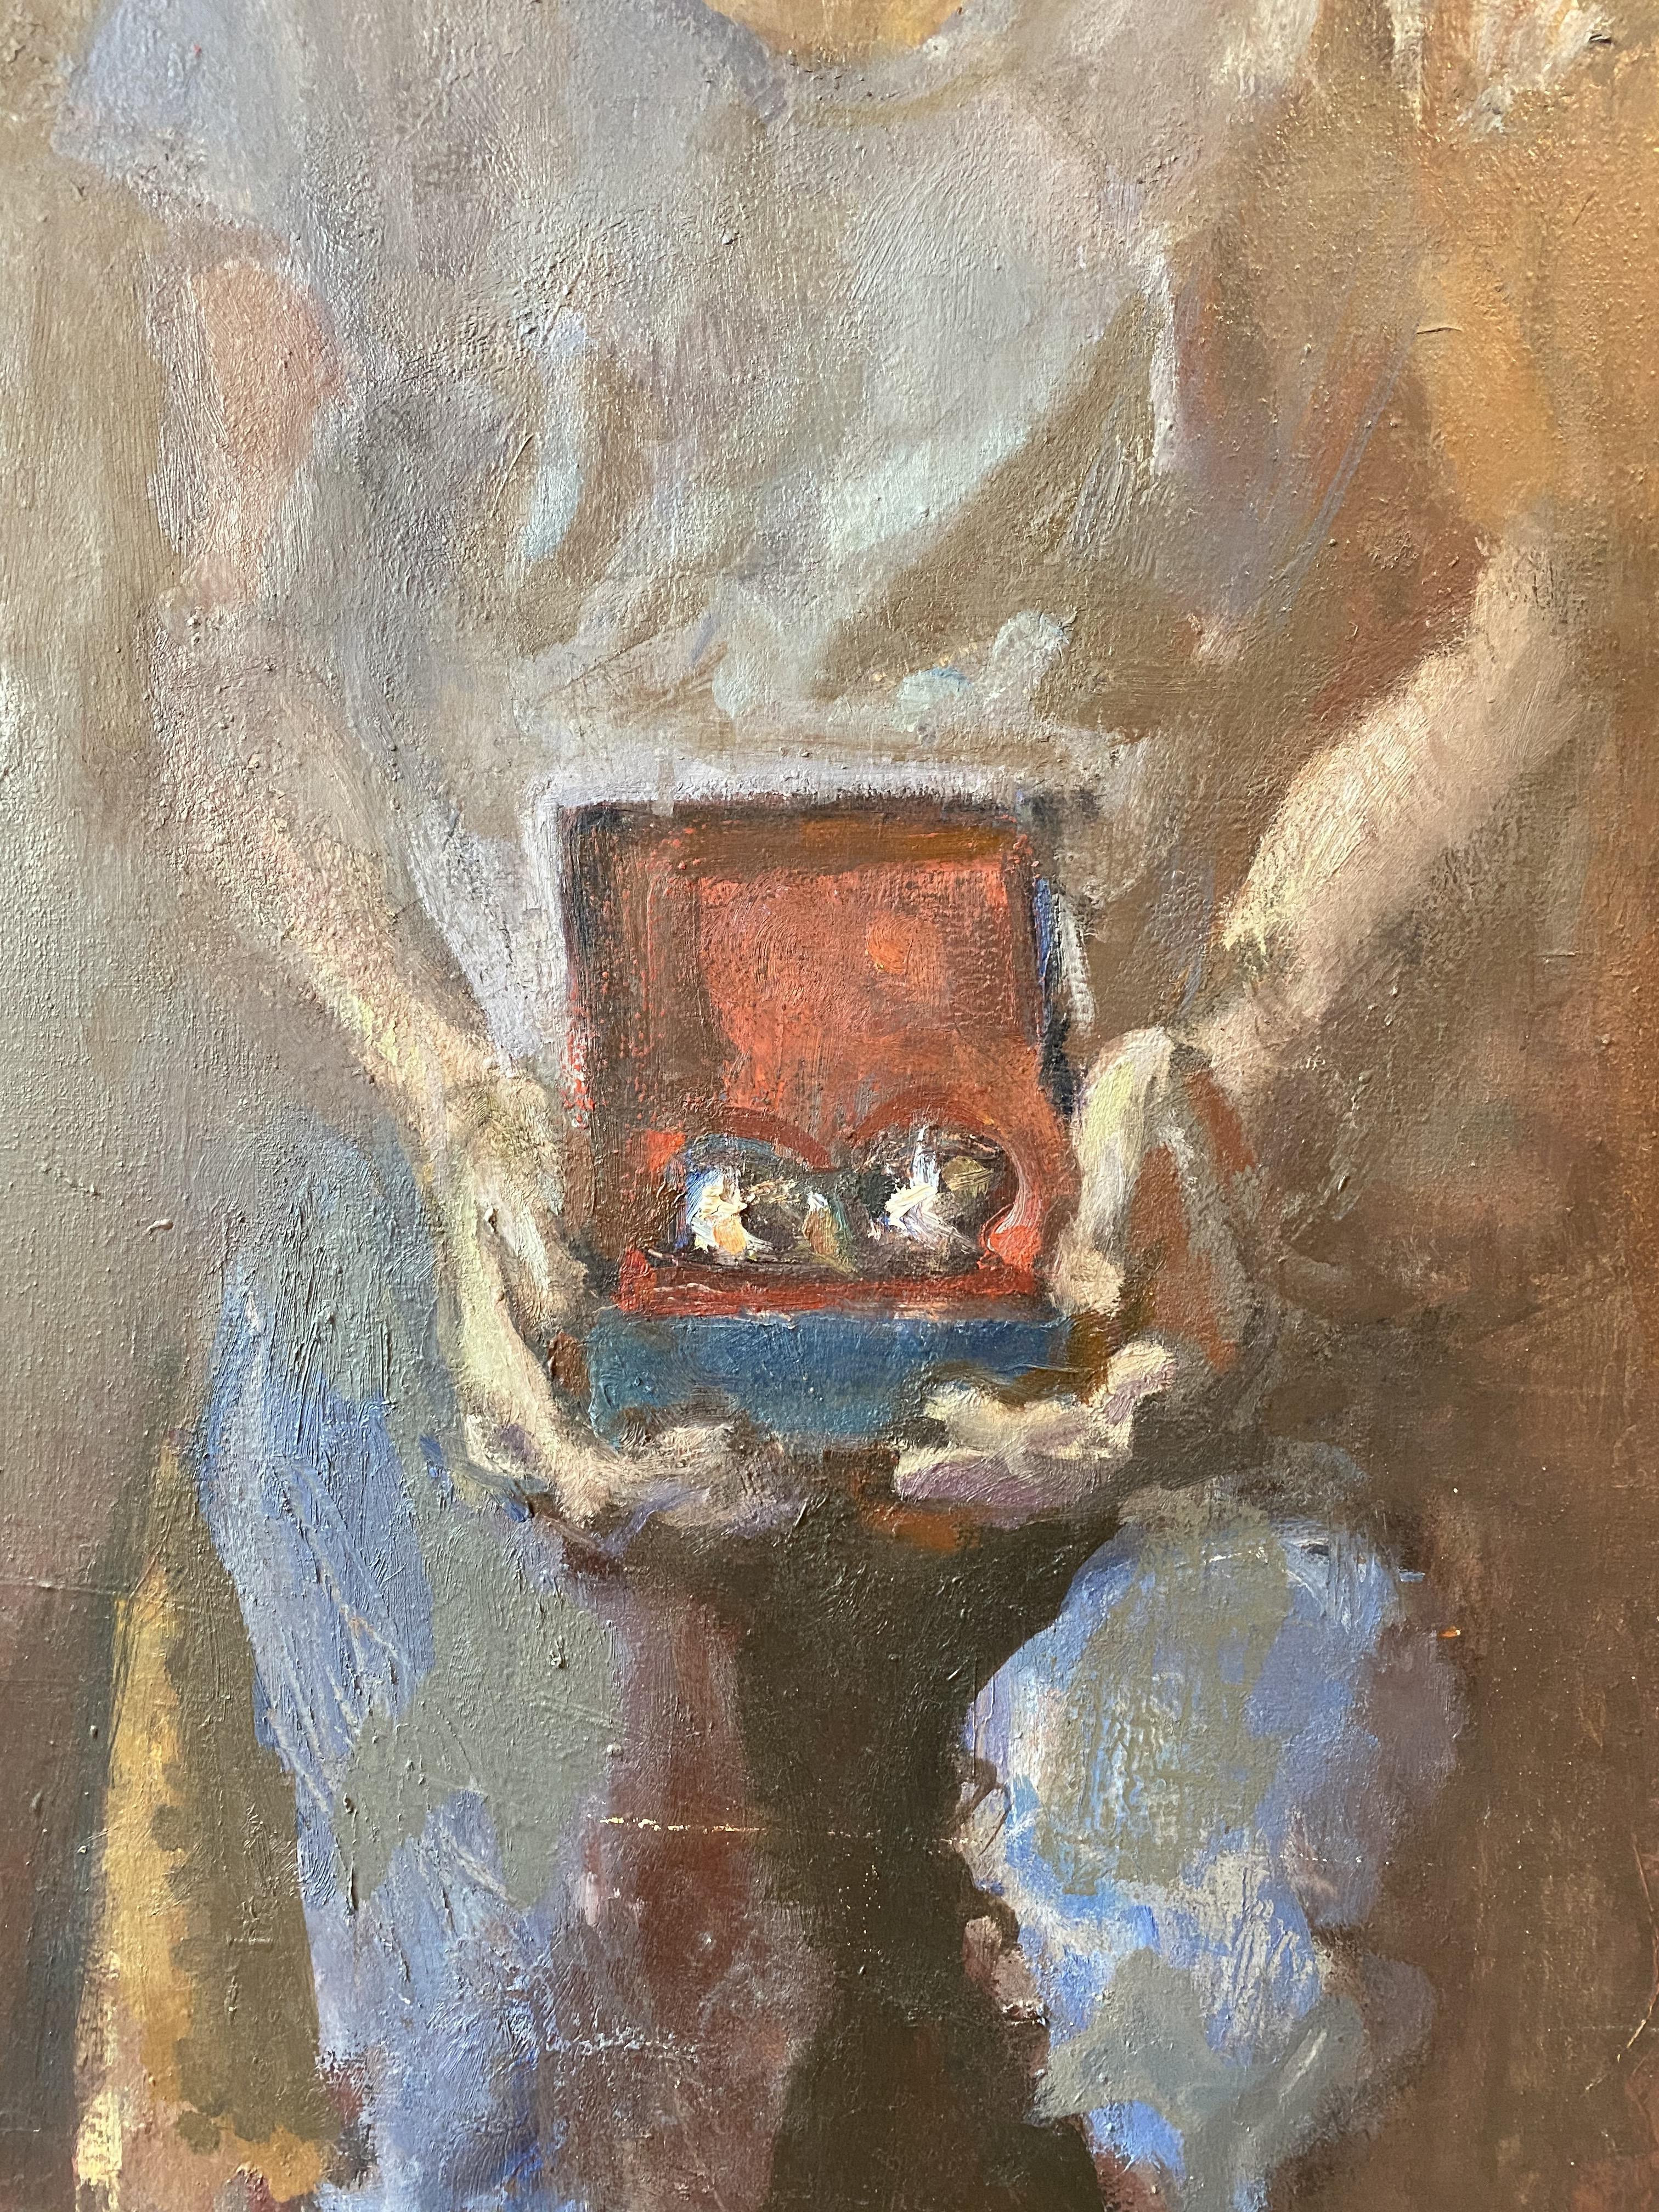 Dimitris Katsigiannis (Greek, born 1960) (AR), A Lady with a box,oil on canvas, 79 x 60 cm. - Image 2 of 3